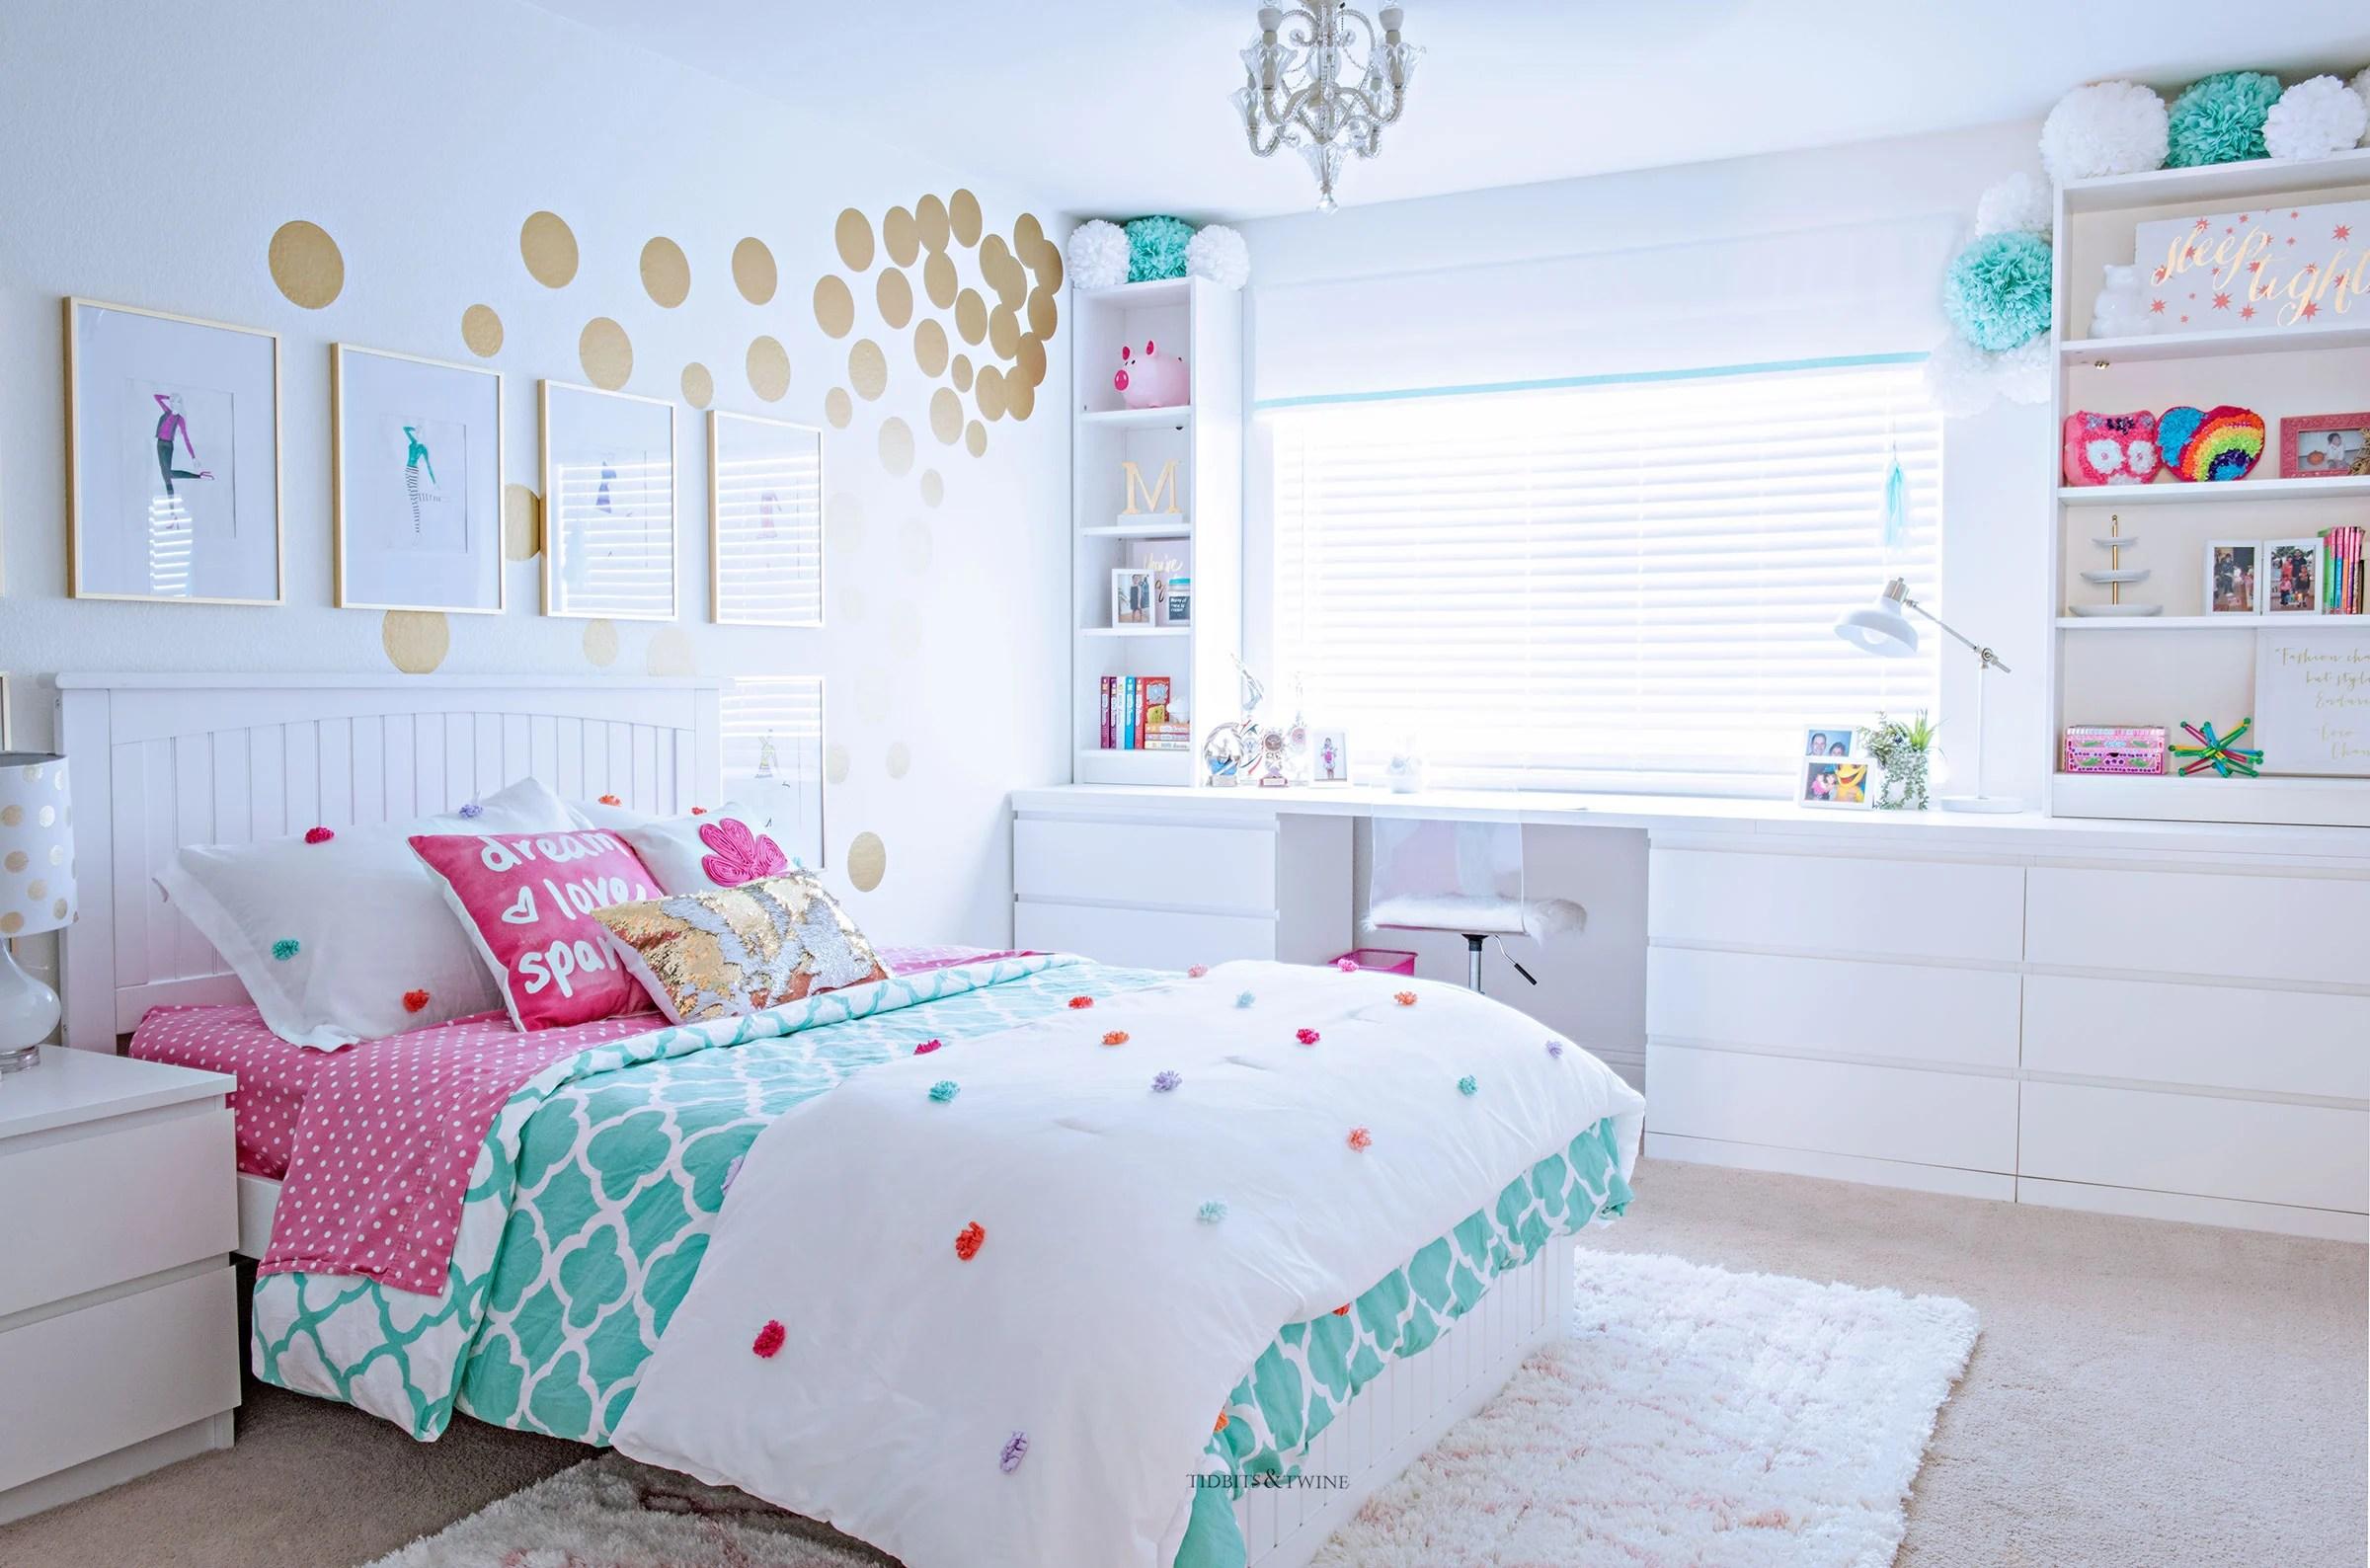 Teen/Tween Girls Bedroom Makeover Idea on a Budget ... on Room Decoration Girl  id=16133